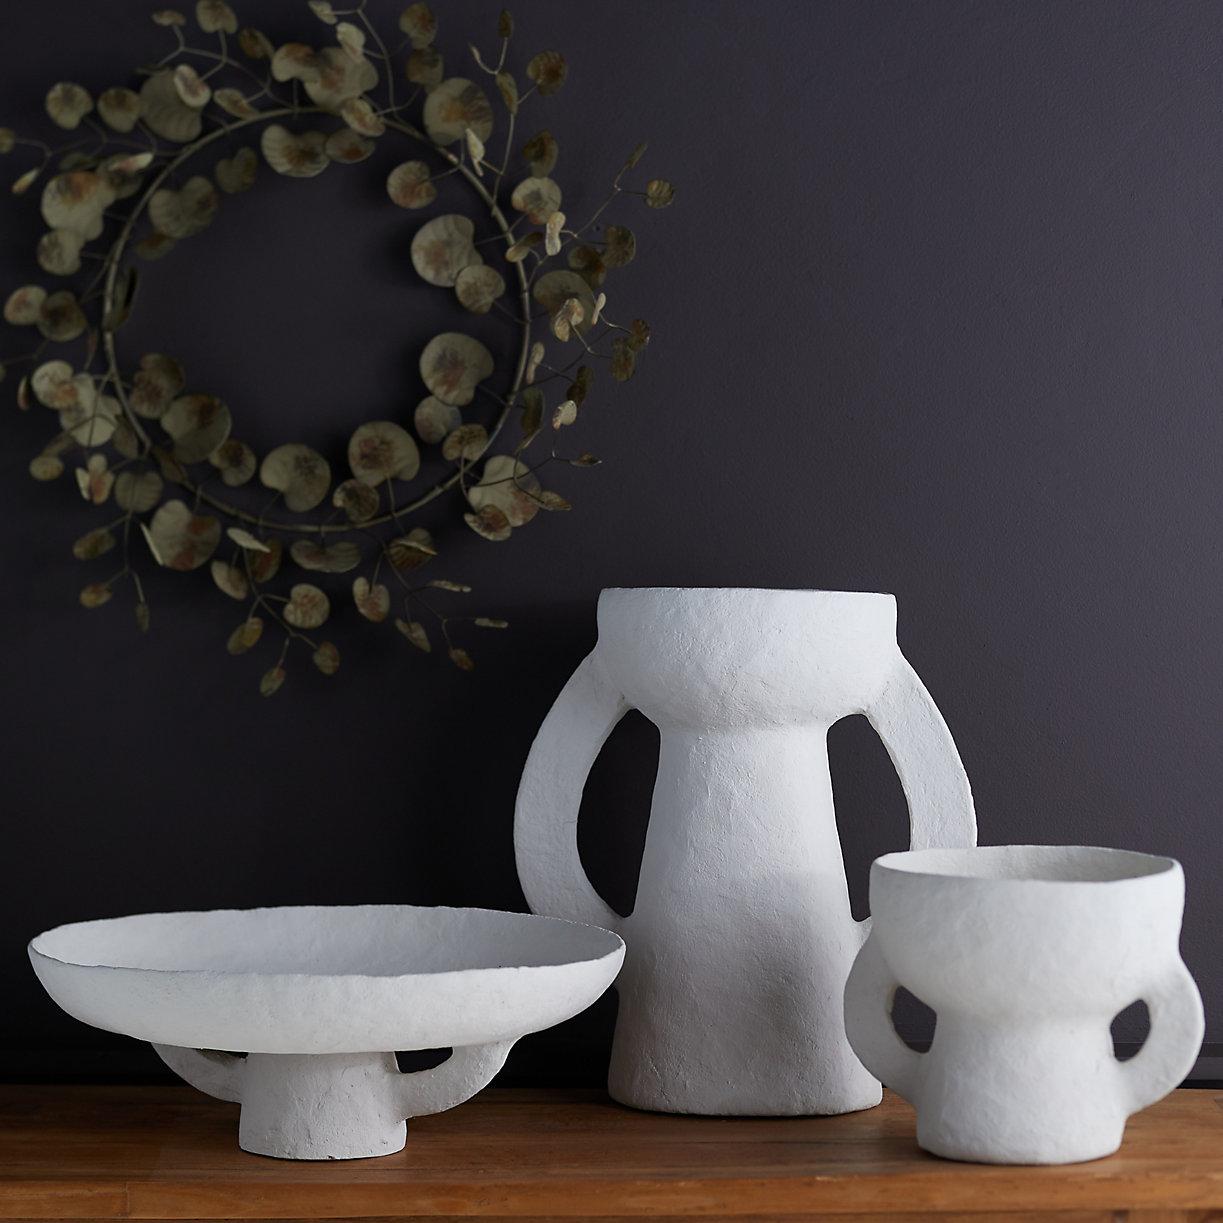 Earth Vase $198.00–$328.00